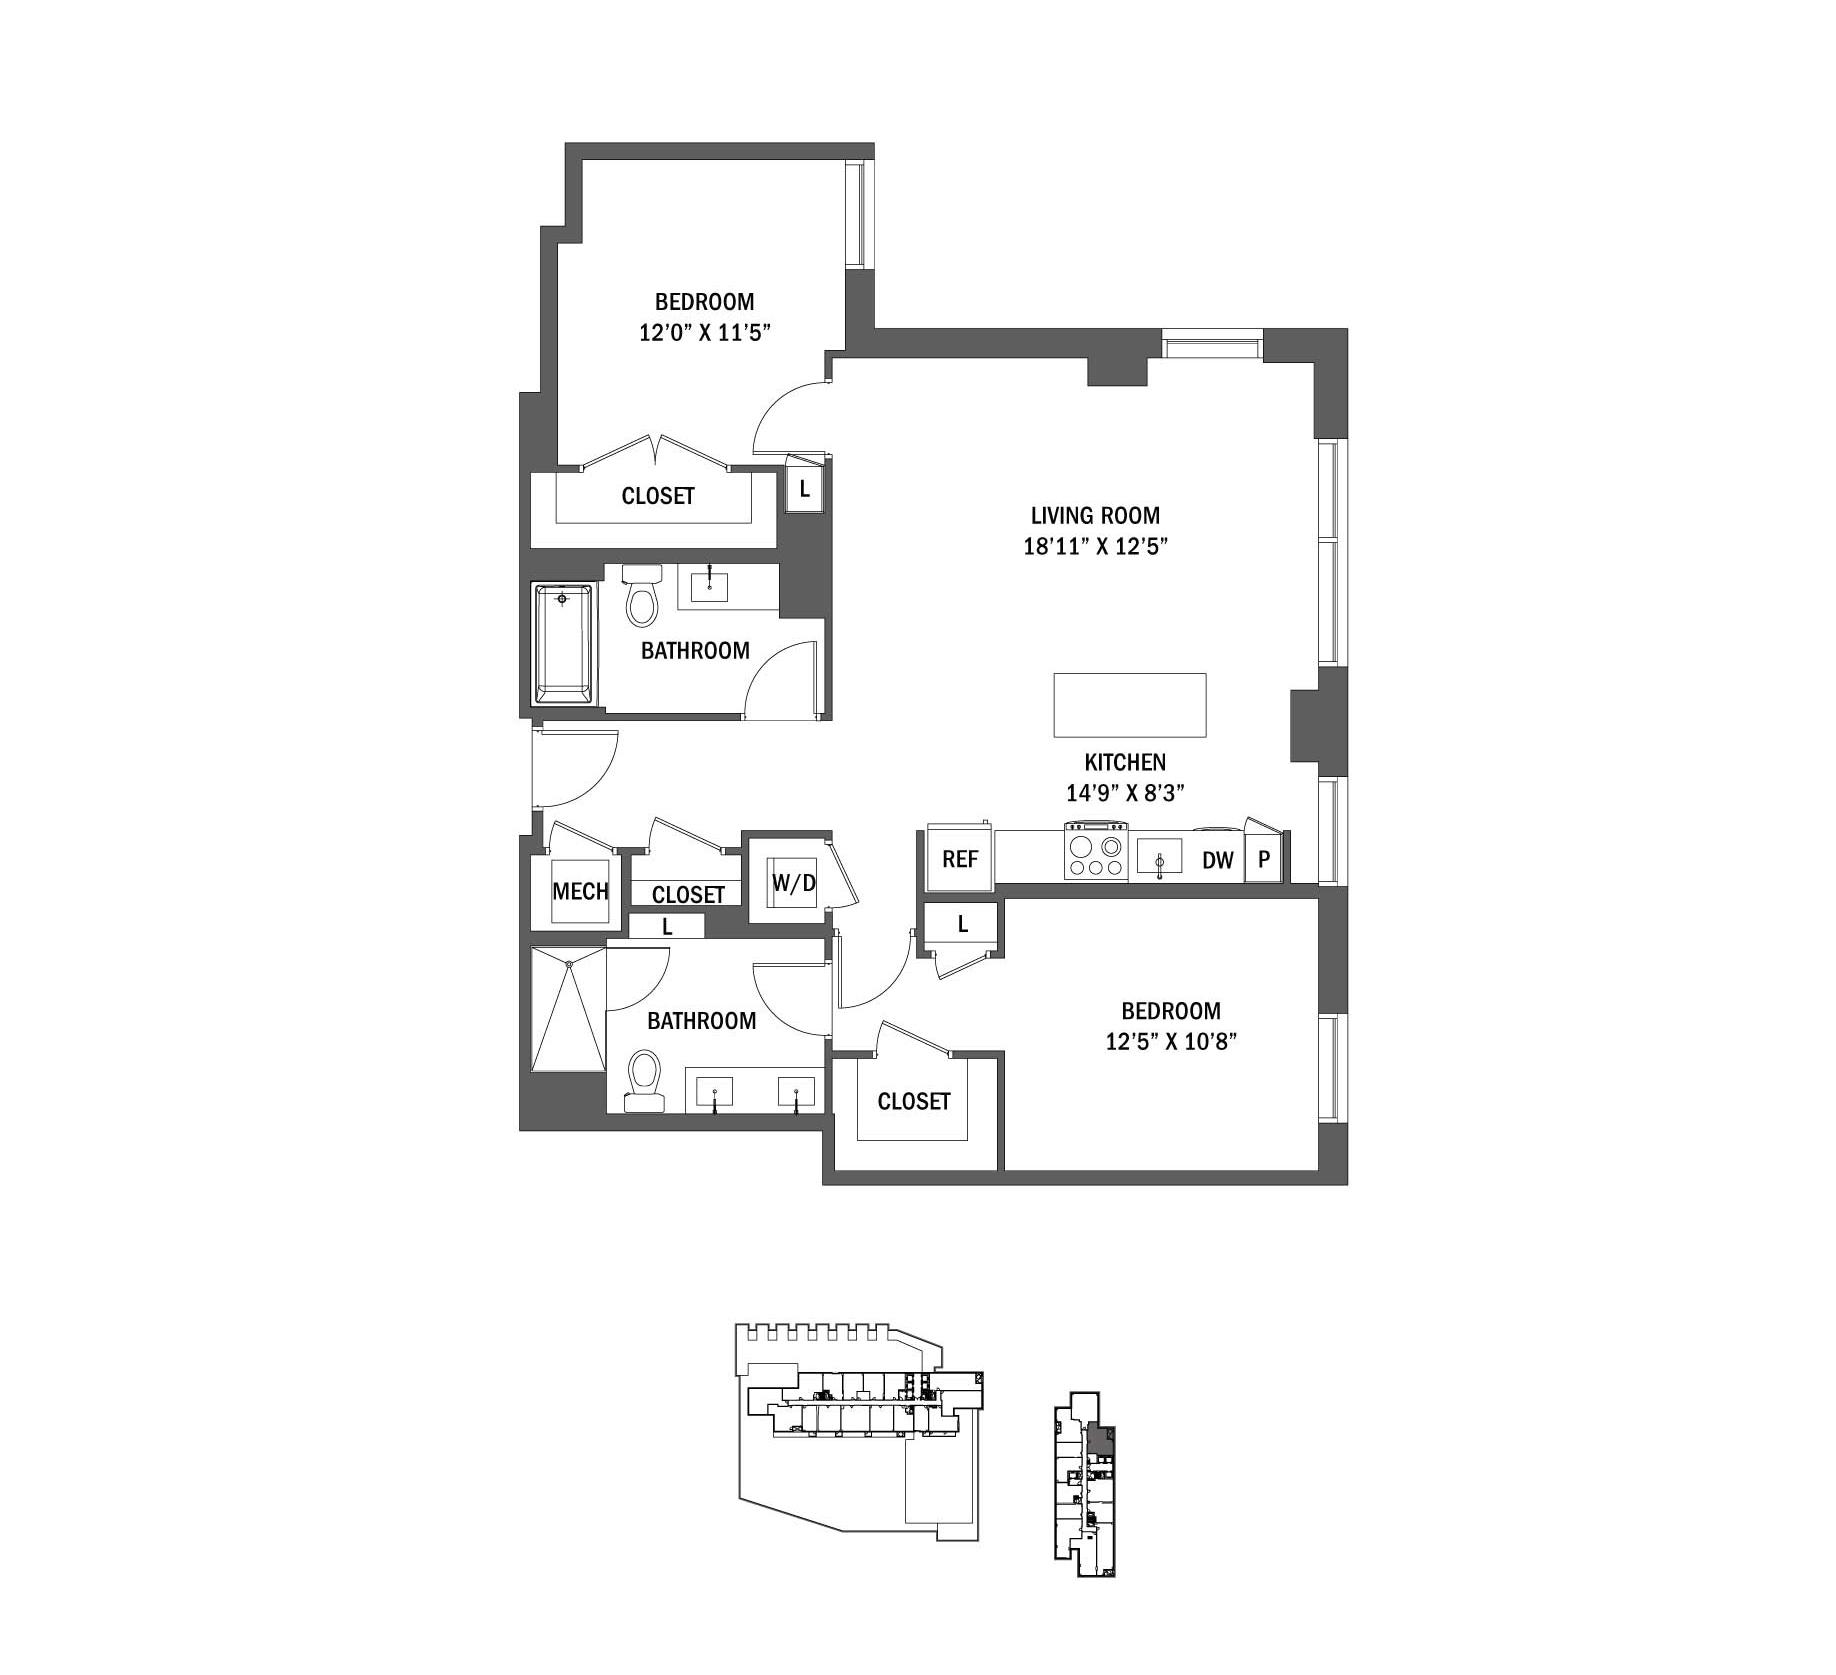 P0625338 789bc24 e01 03 2 floorplan